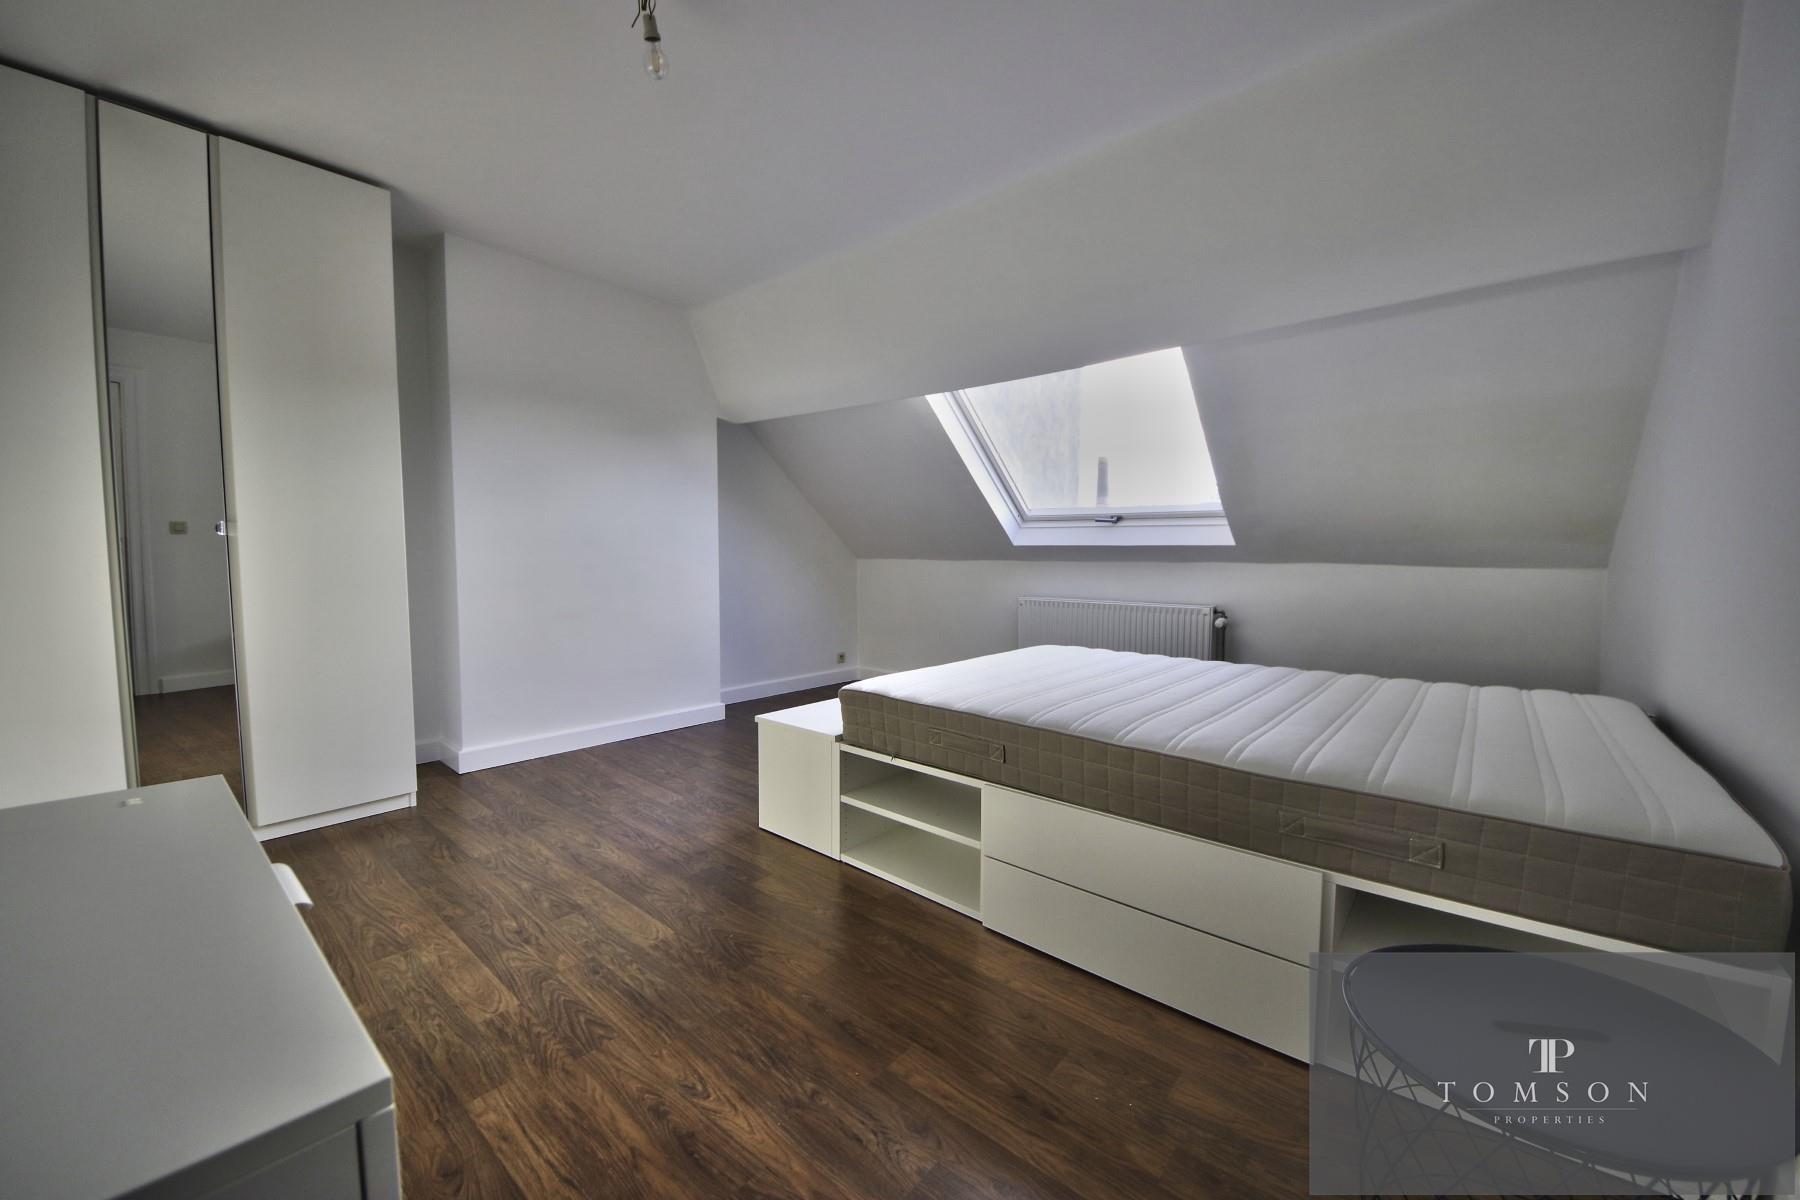 Flat - Etterbeek - #4239851-3